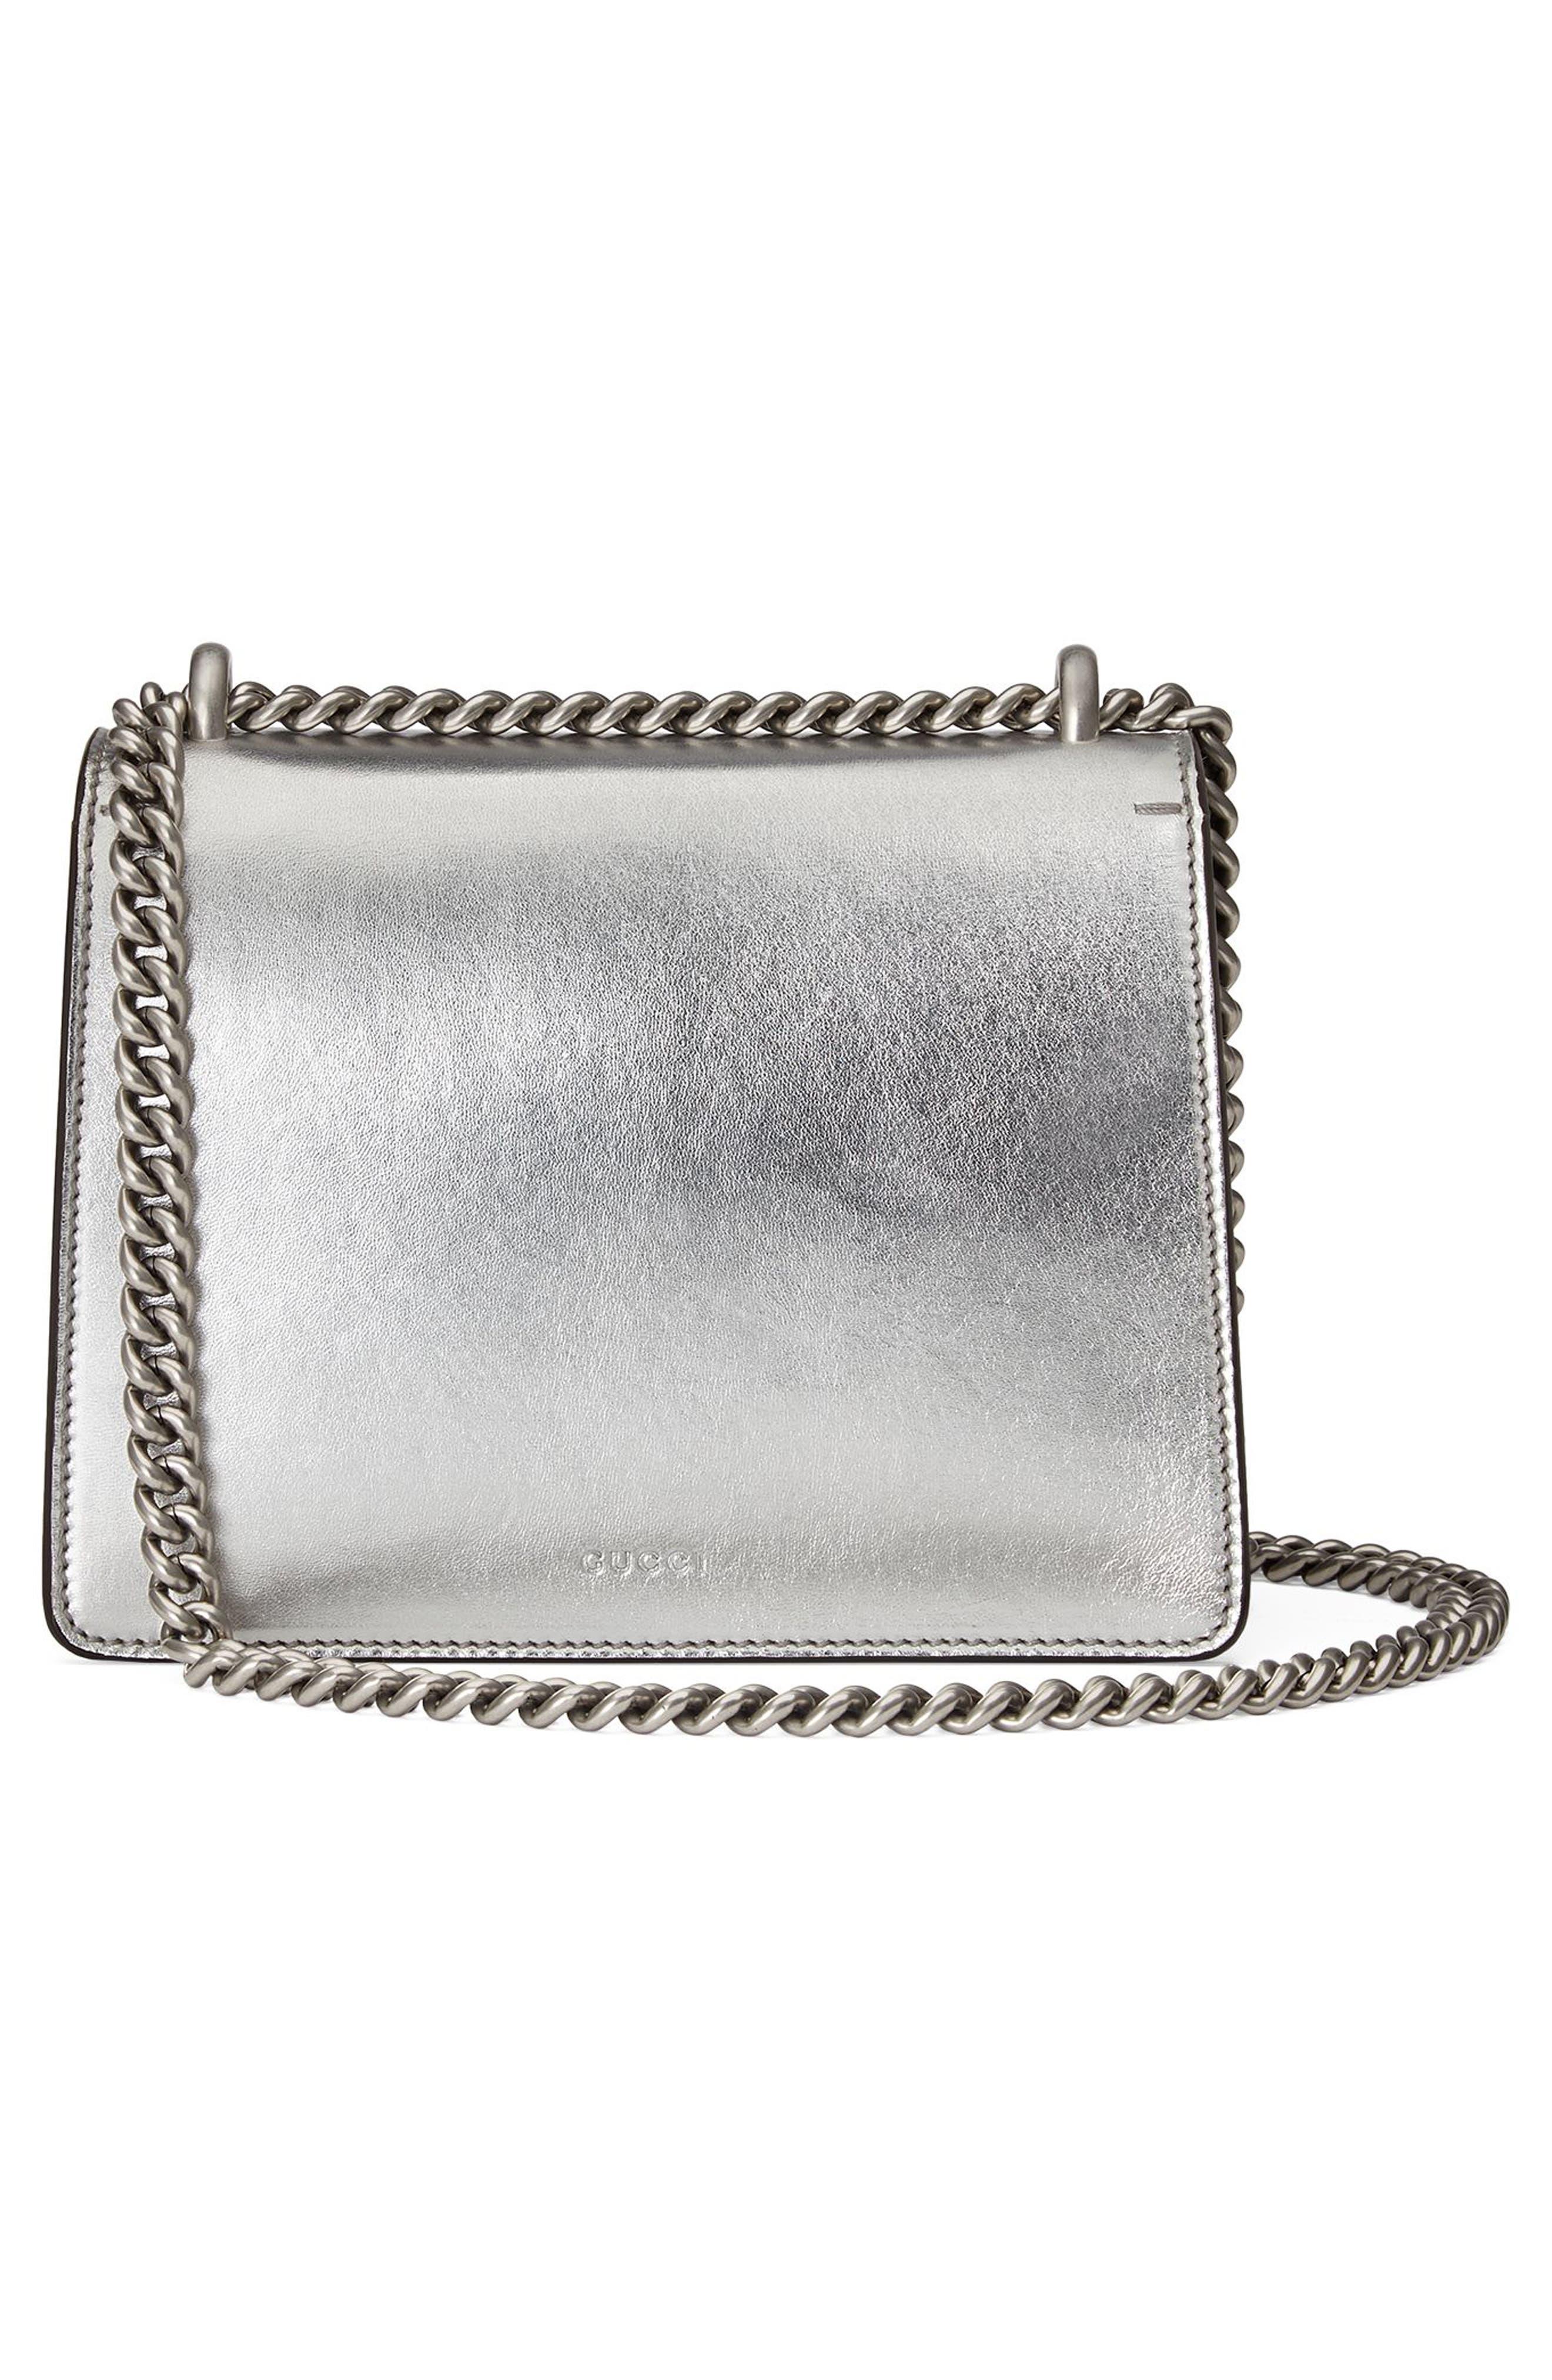 Mini Dionysus Metallic Leather Shoulder Bag,                             Alternate thumbnail 2, color,                             Argento/Blk Diamond